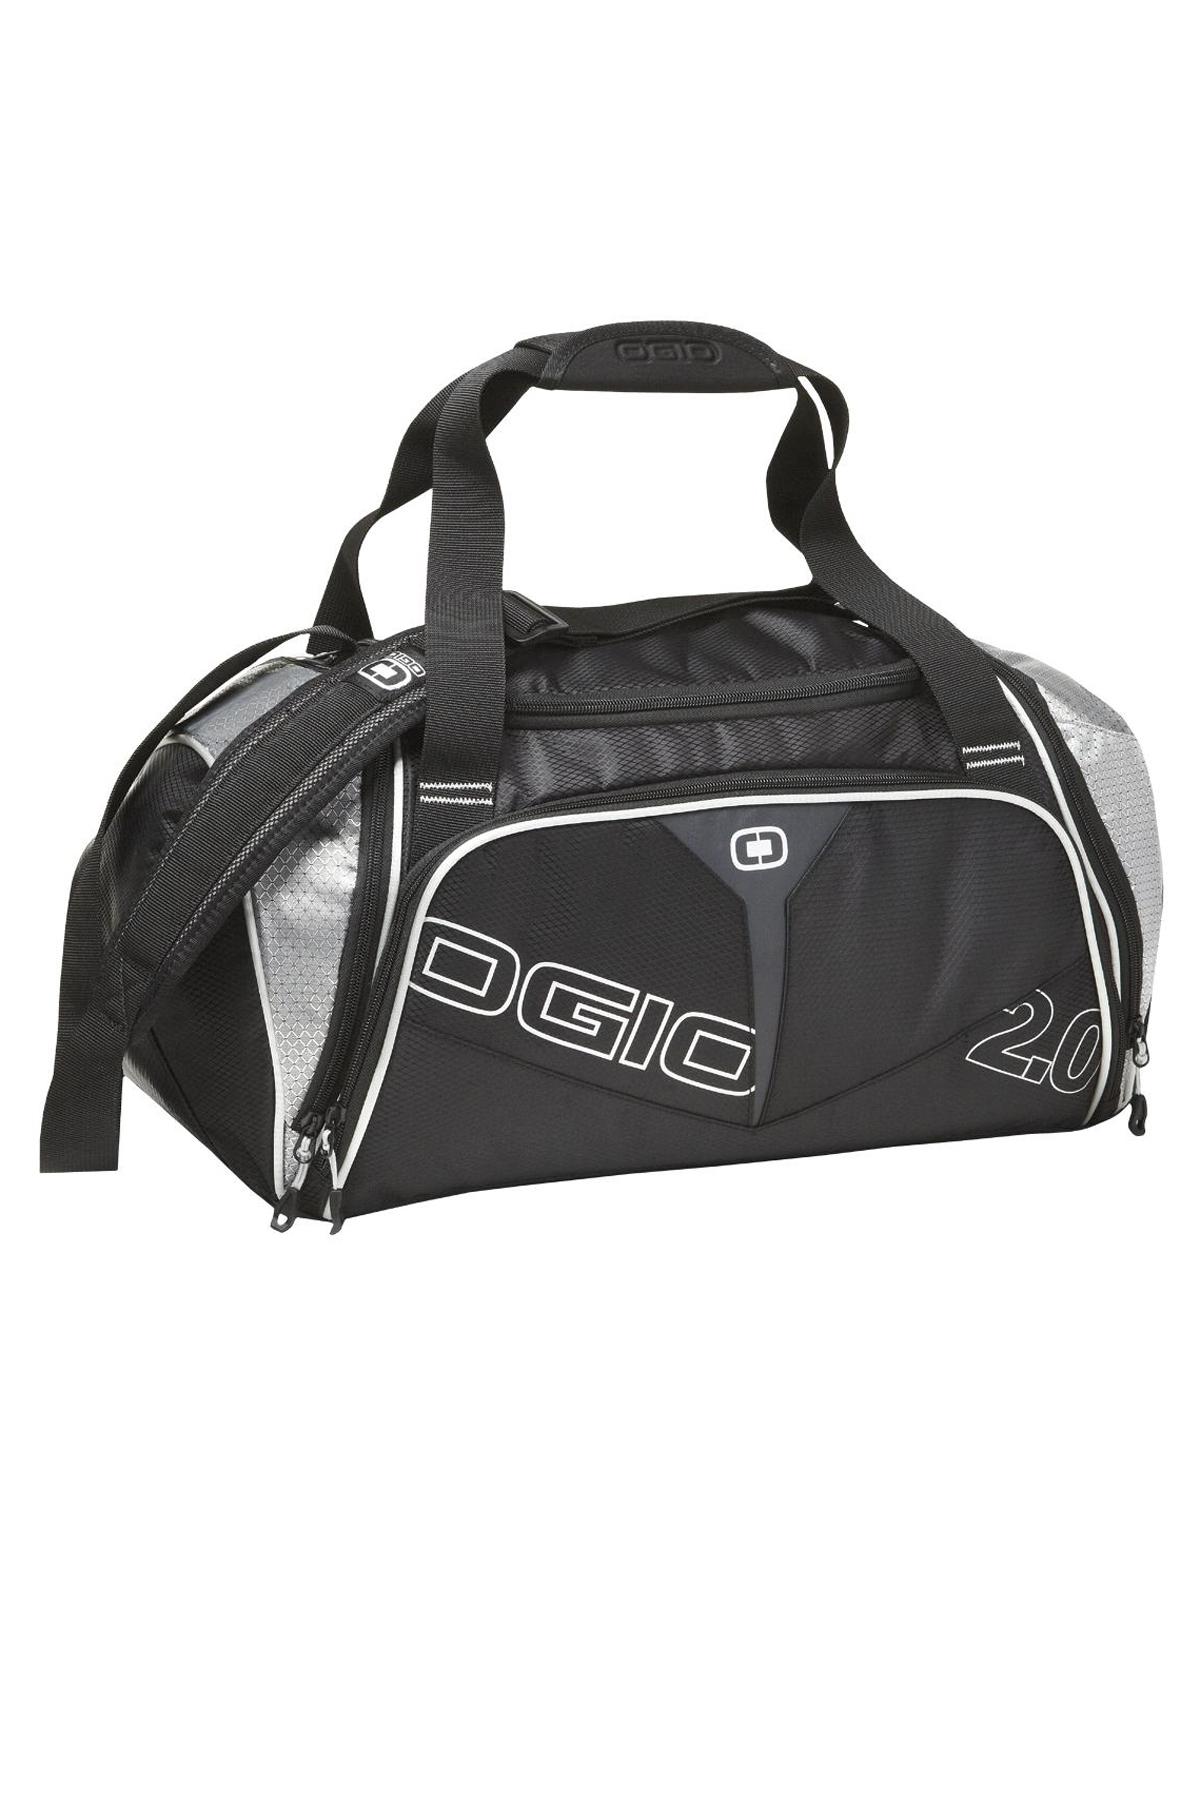 Bags-Duffels-27